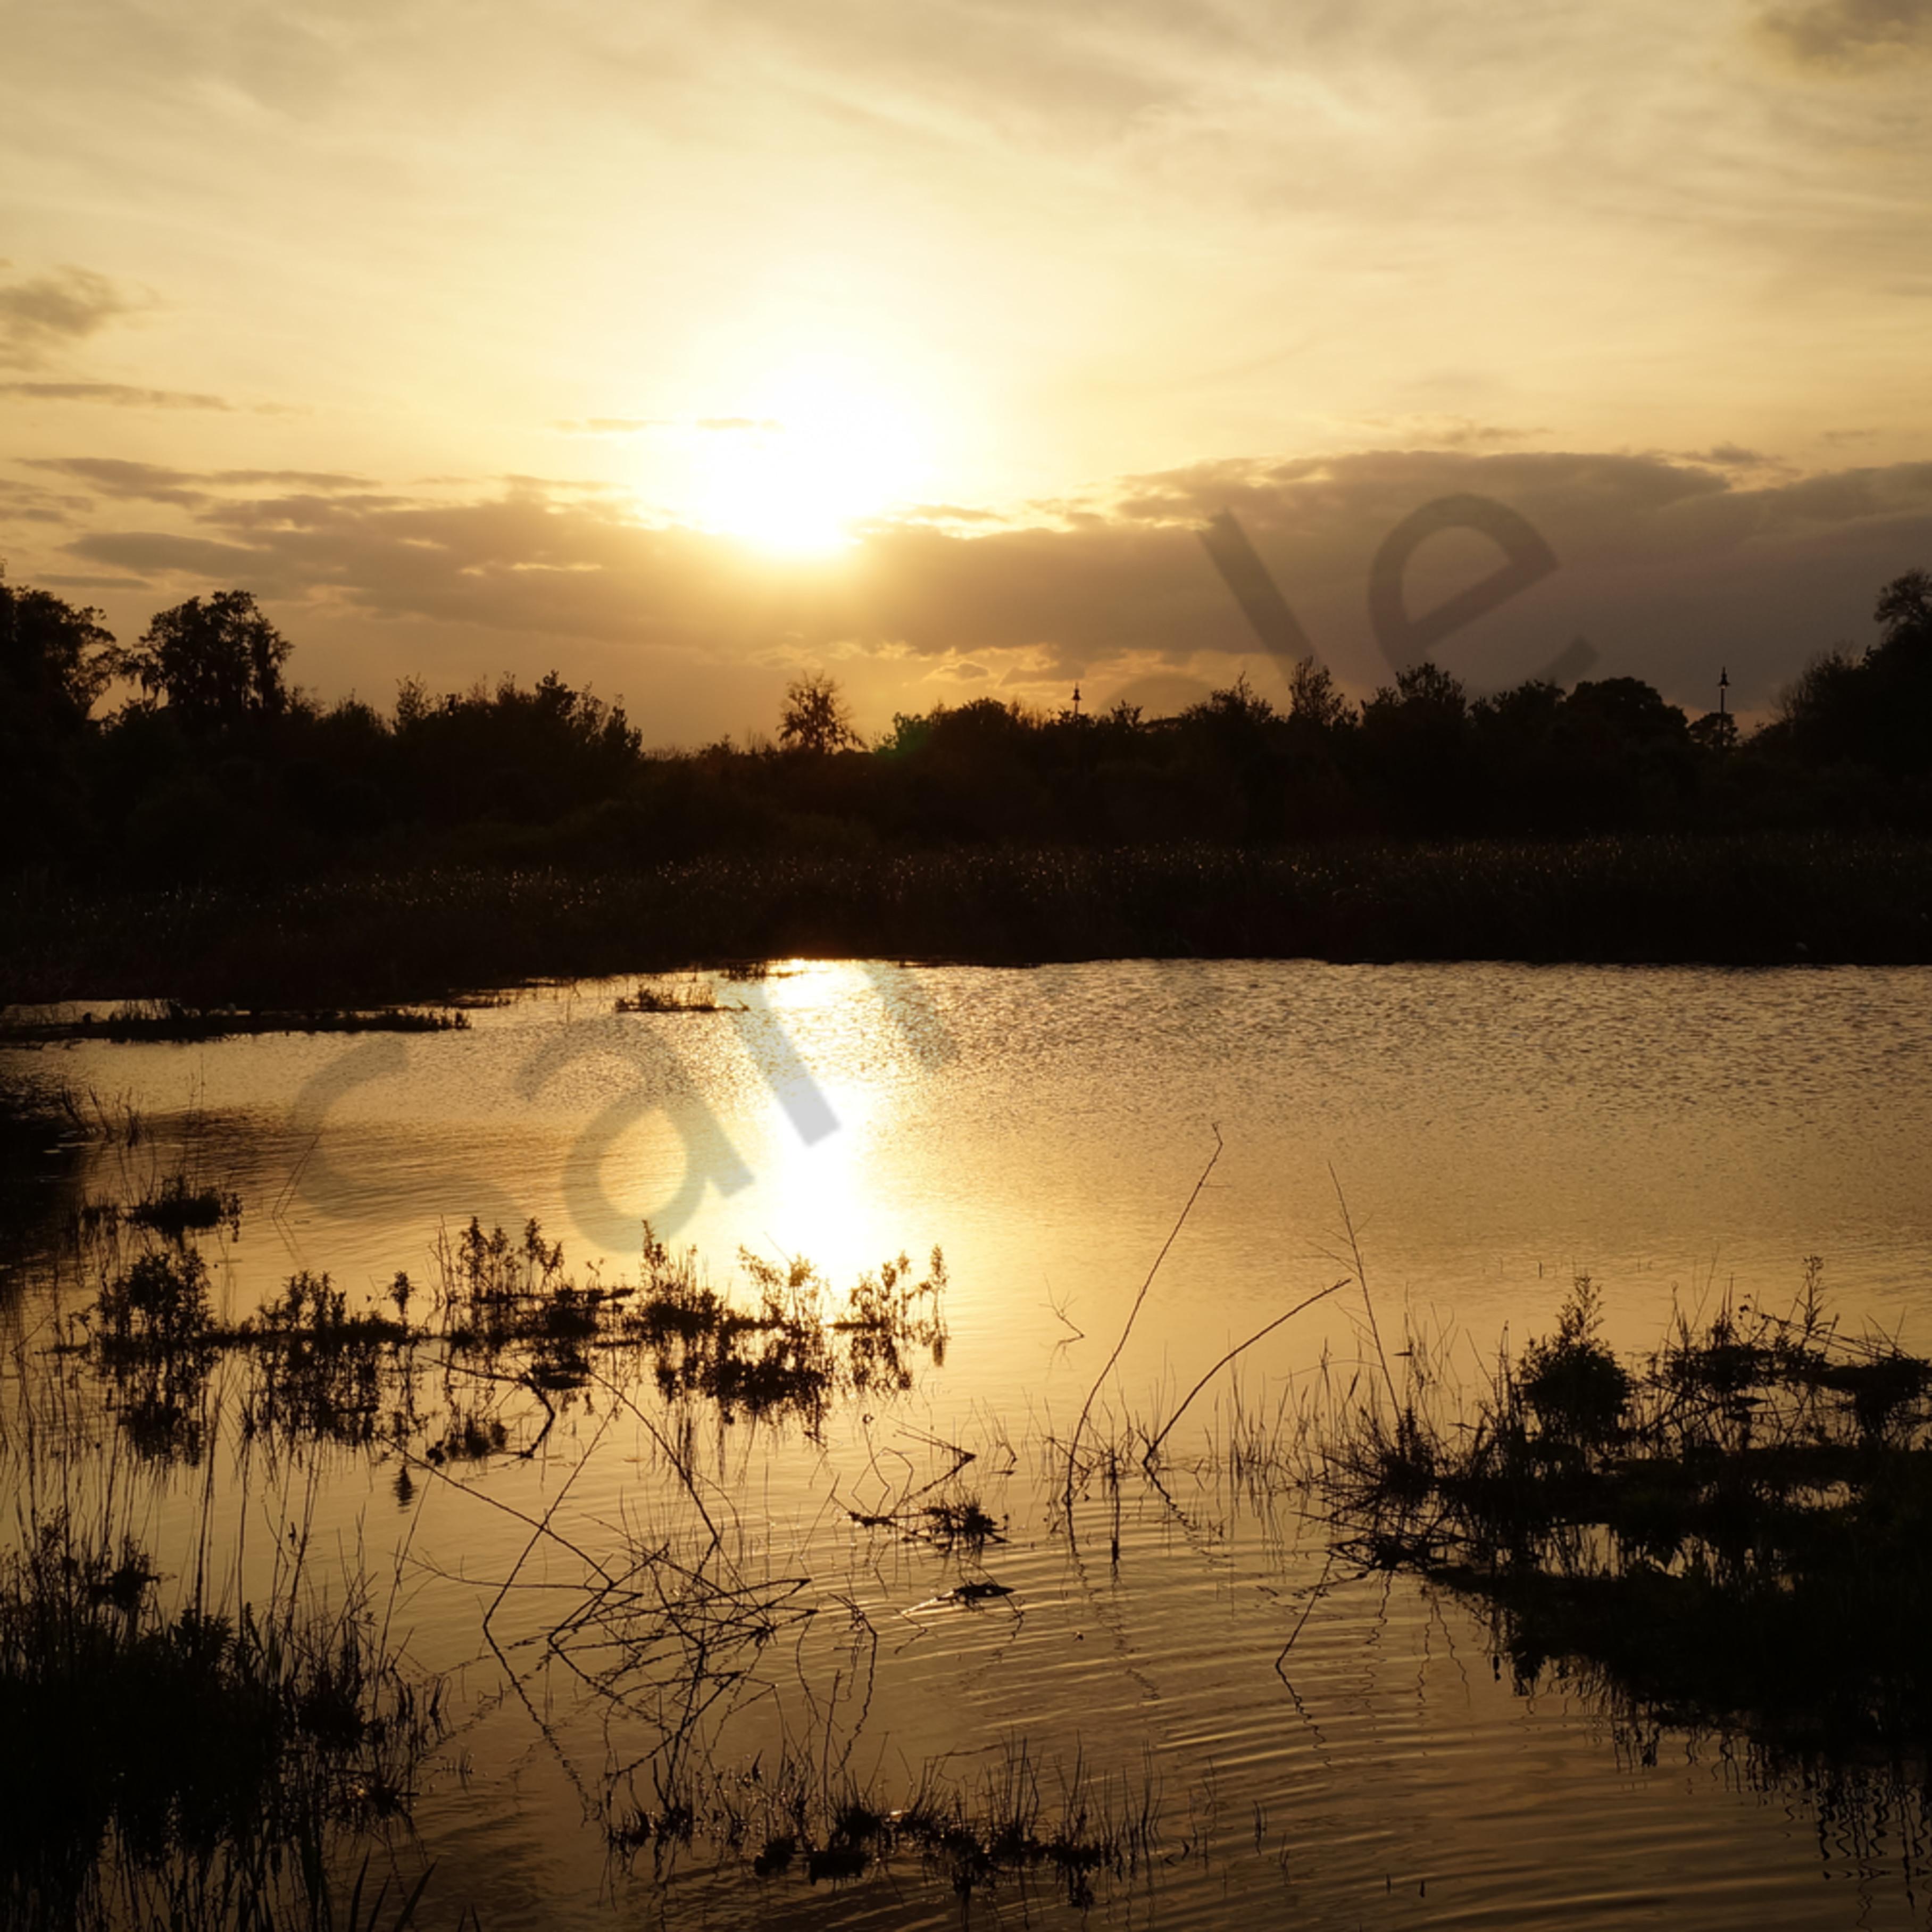 Sunset over the lake jrprrw